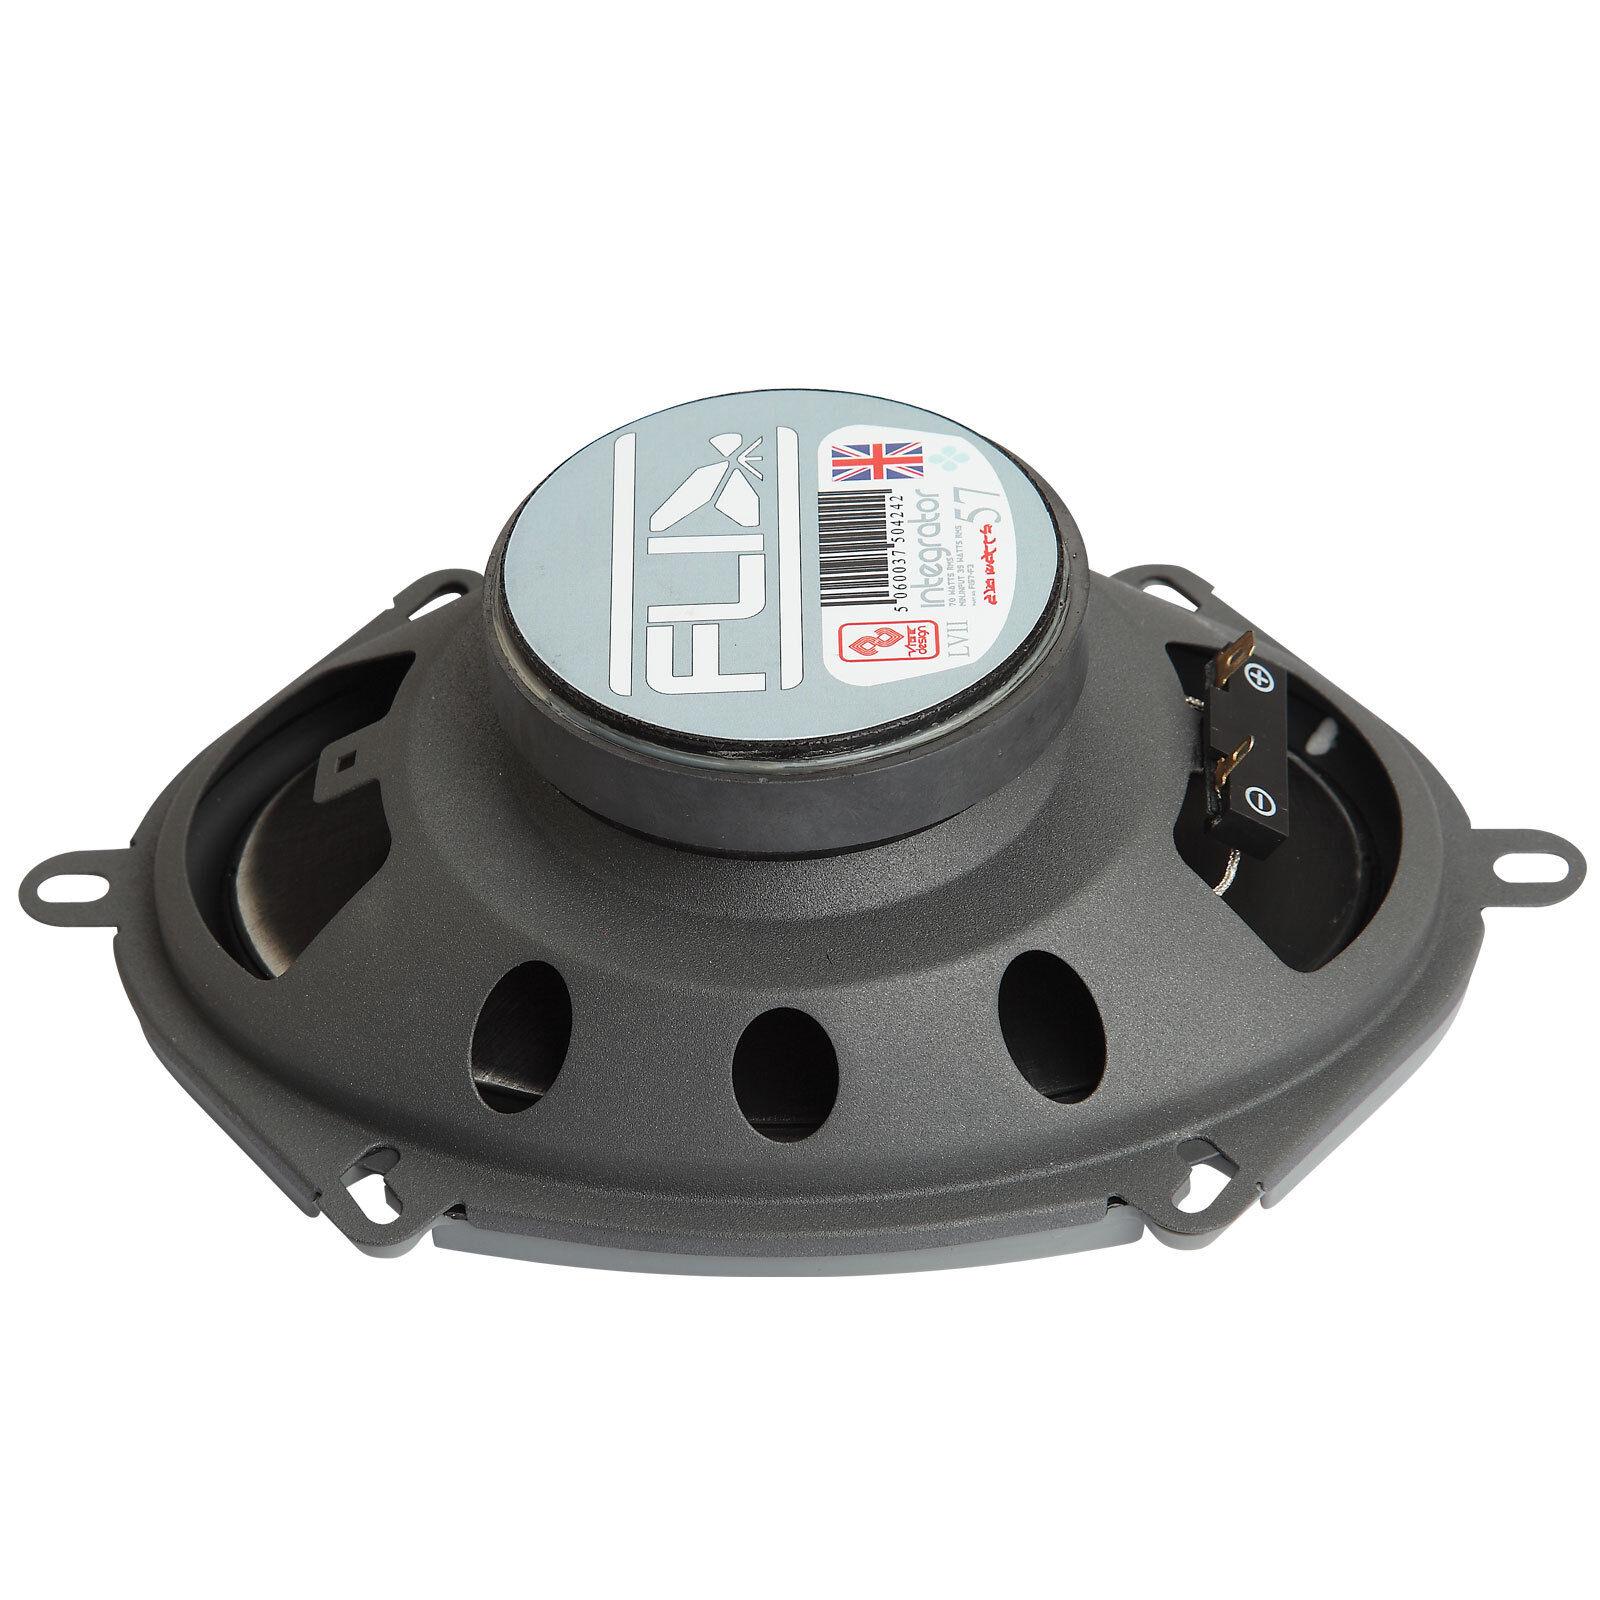 Ford Focus Speaker Size 2014 Stereo Upgrade